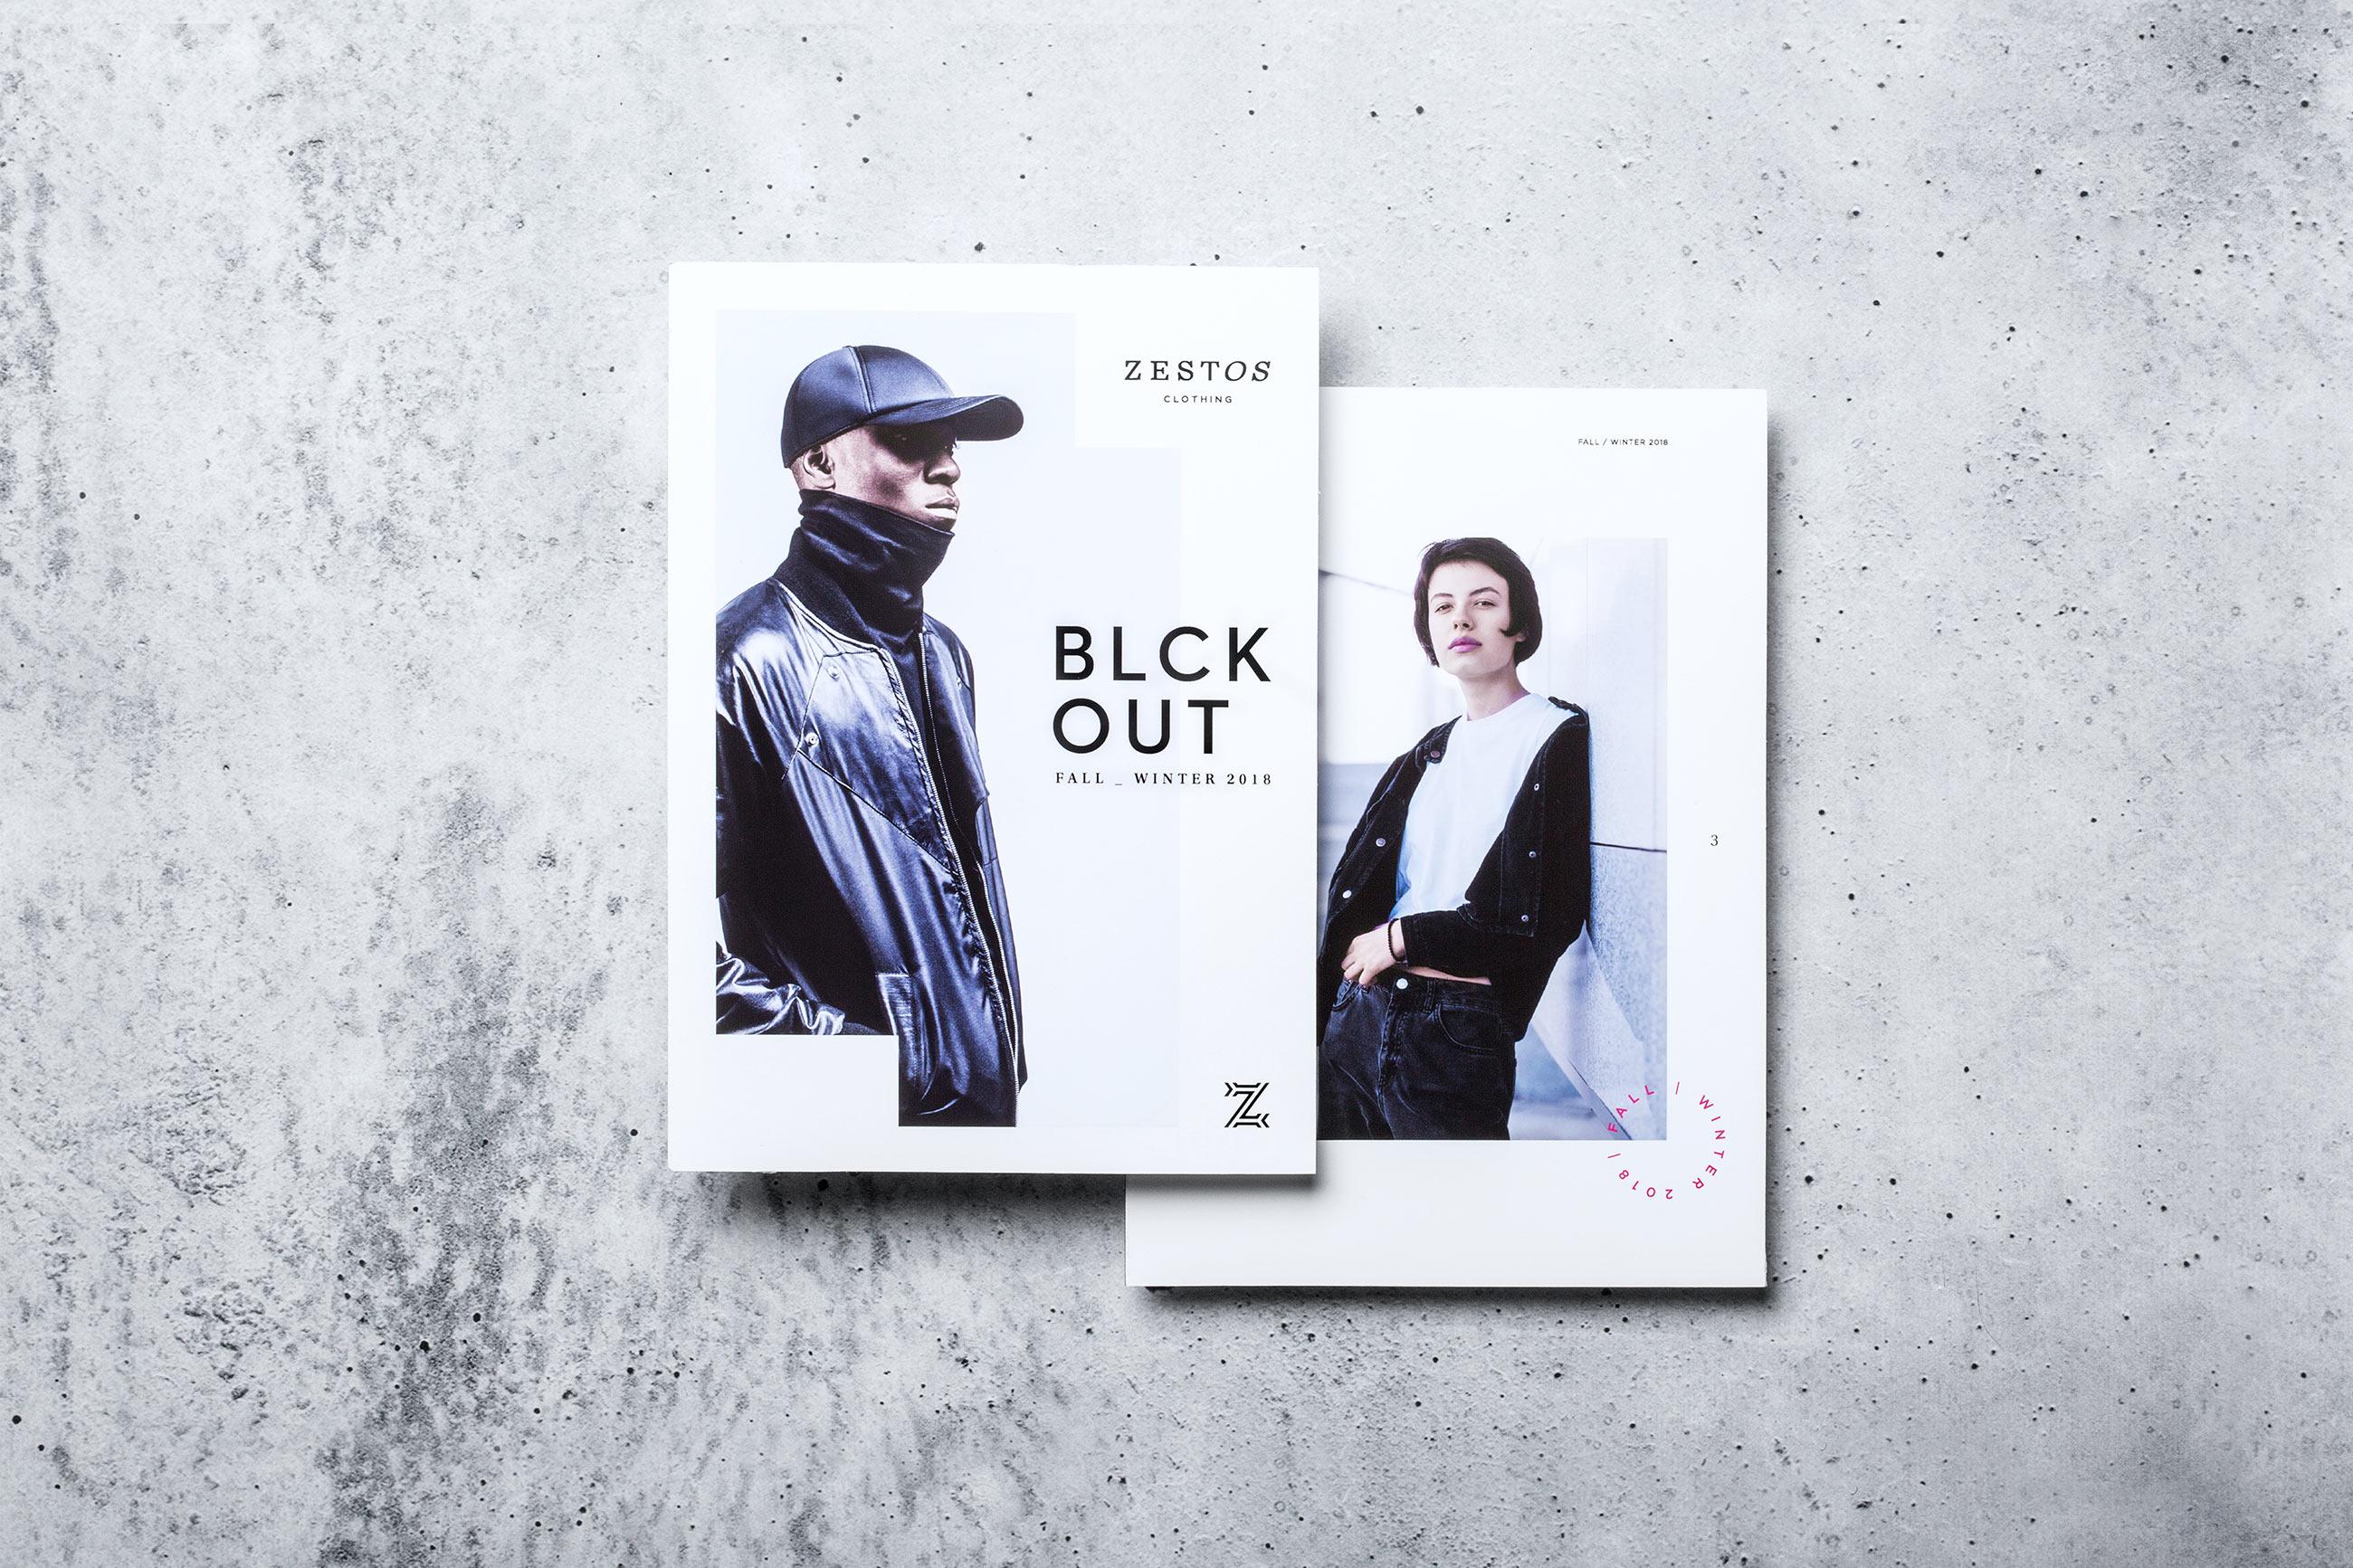 Zestos_SocialMosaic-Look-Book_cover